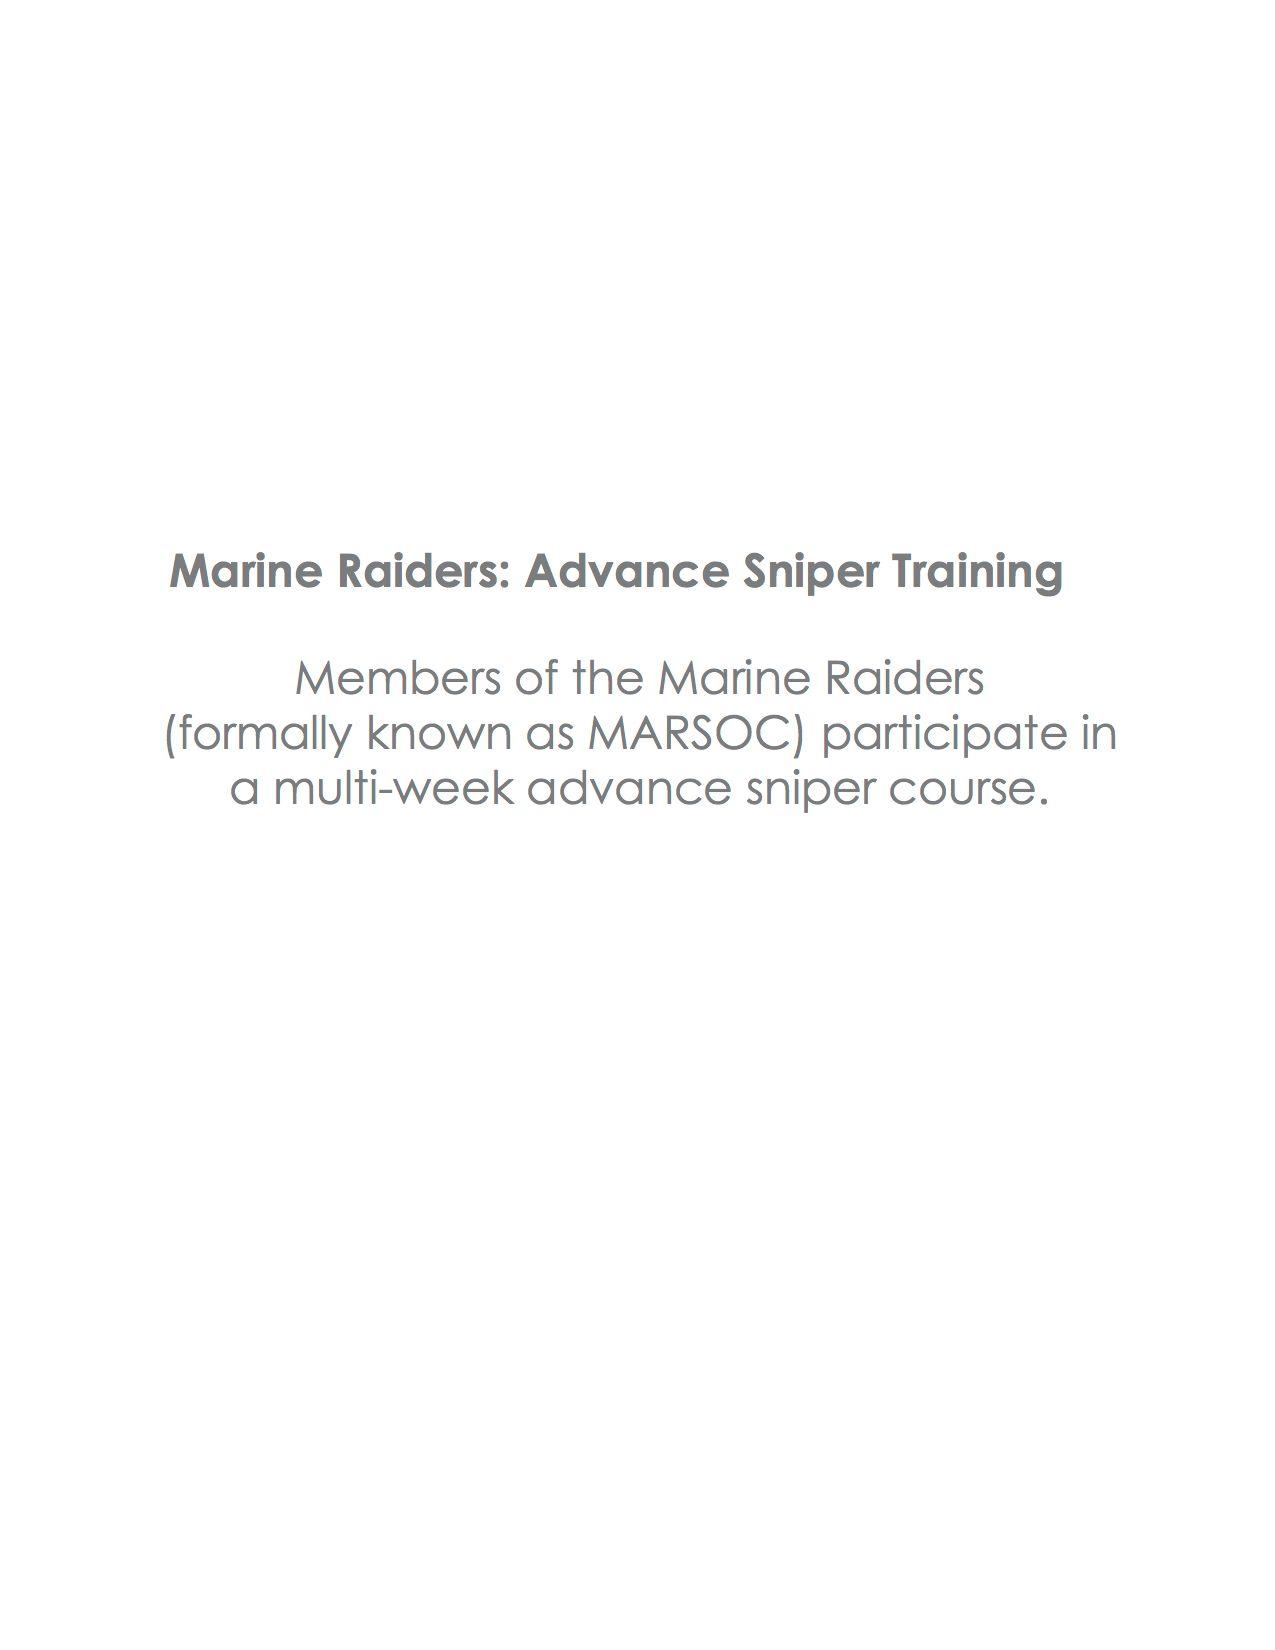 5_marsoc_advanced_sniper_training.jpg